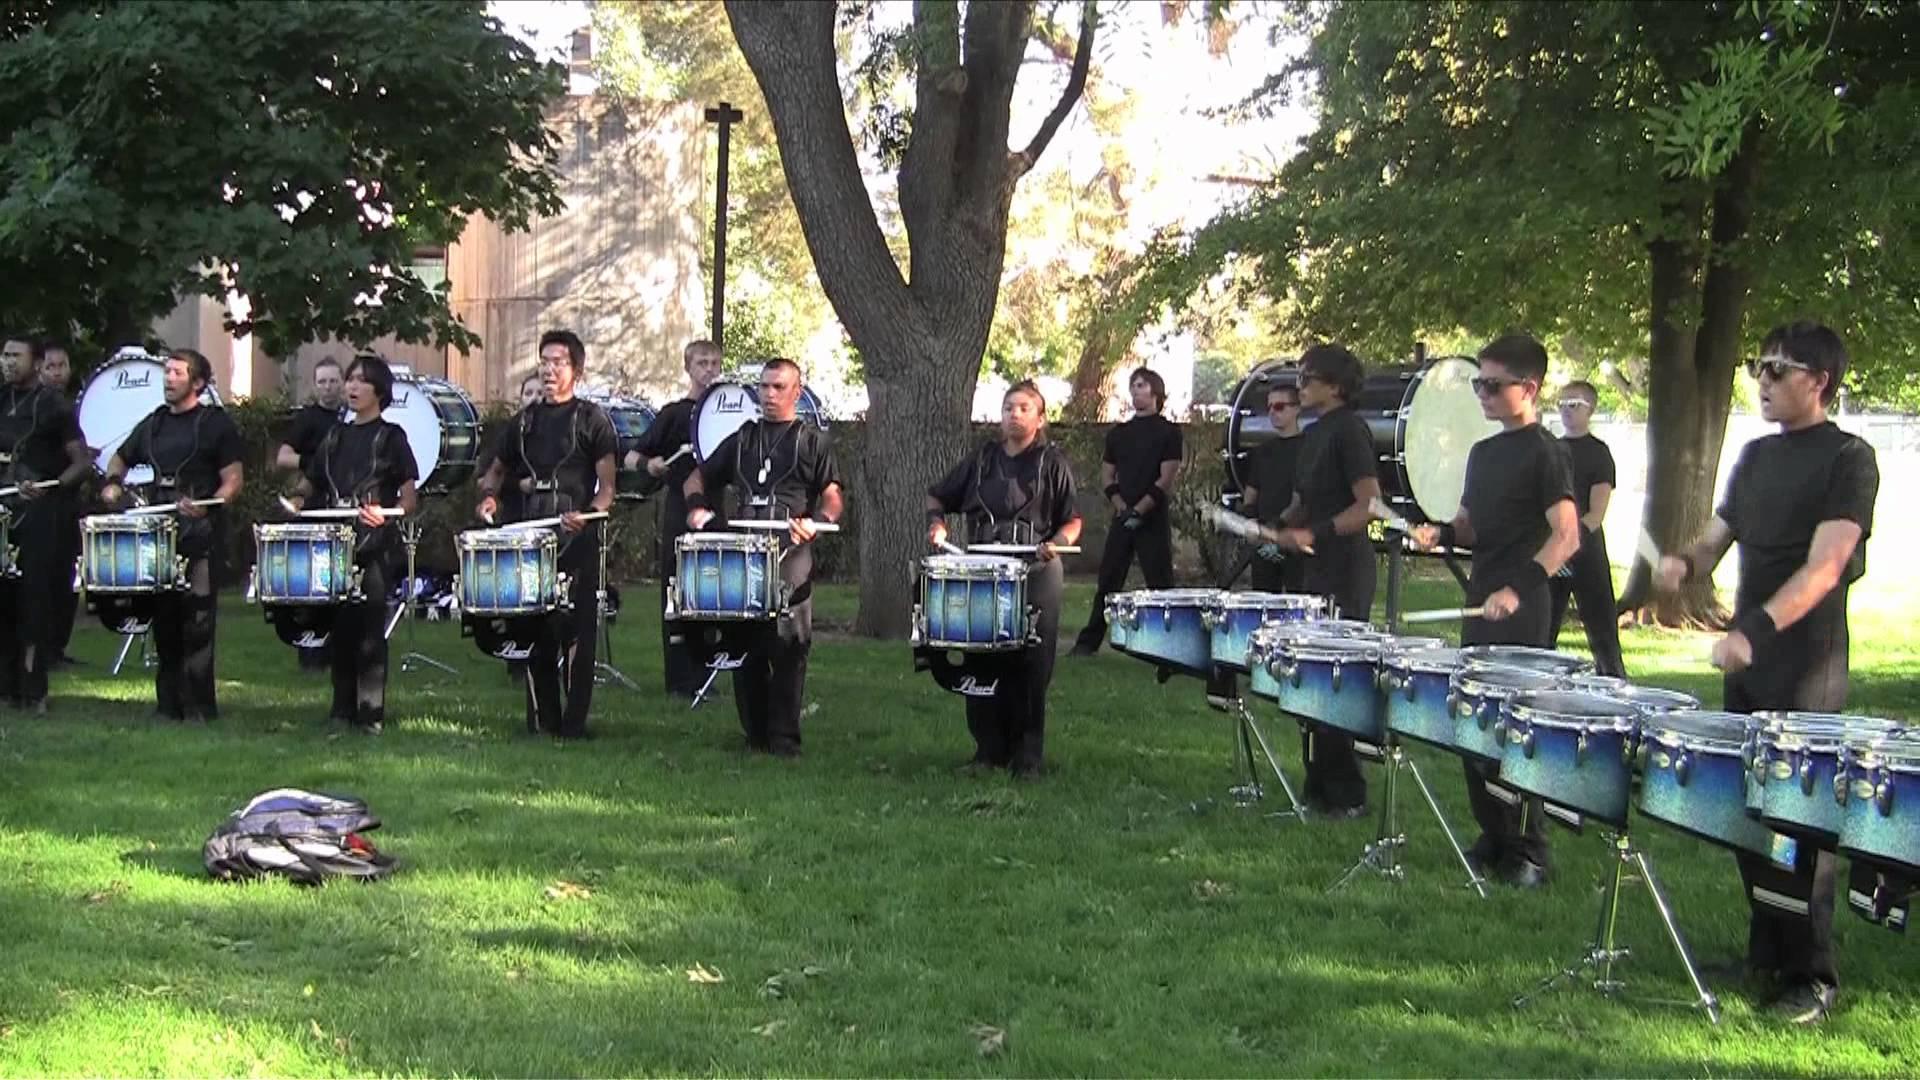 Blue Devils B Drumline 2012 – Show Music 3